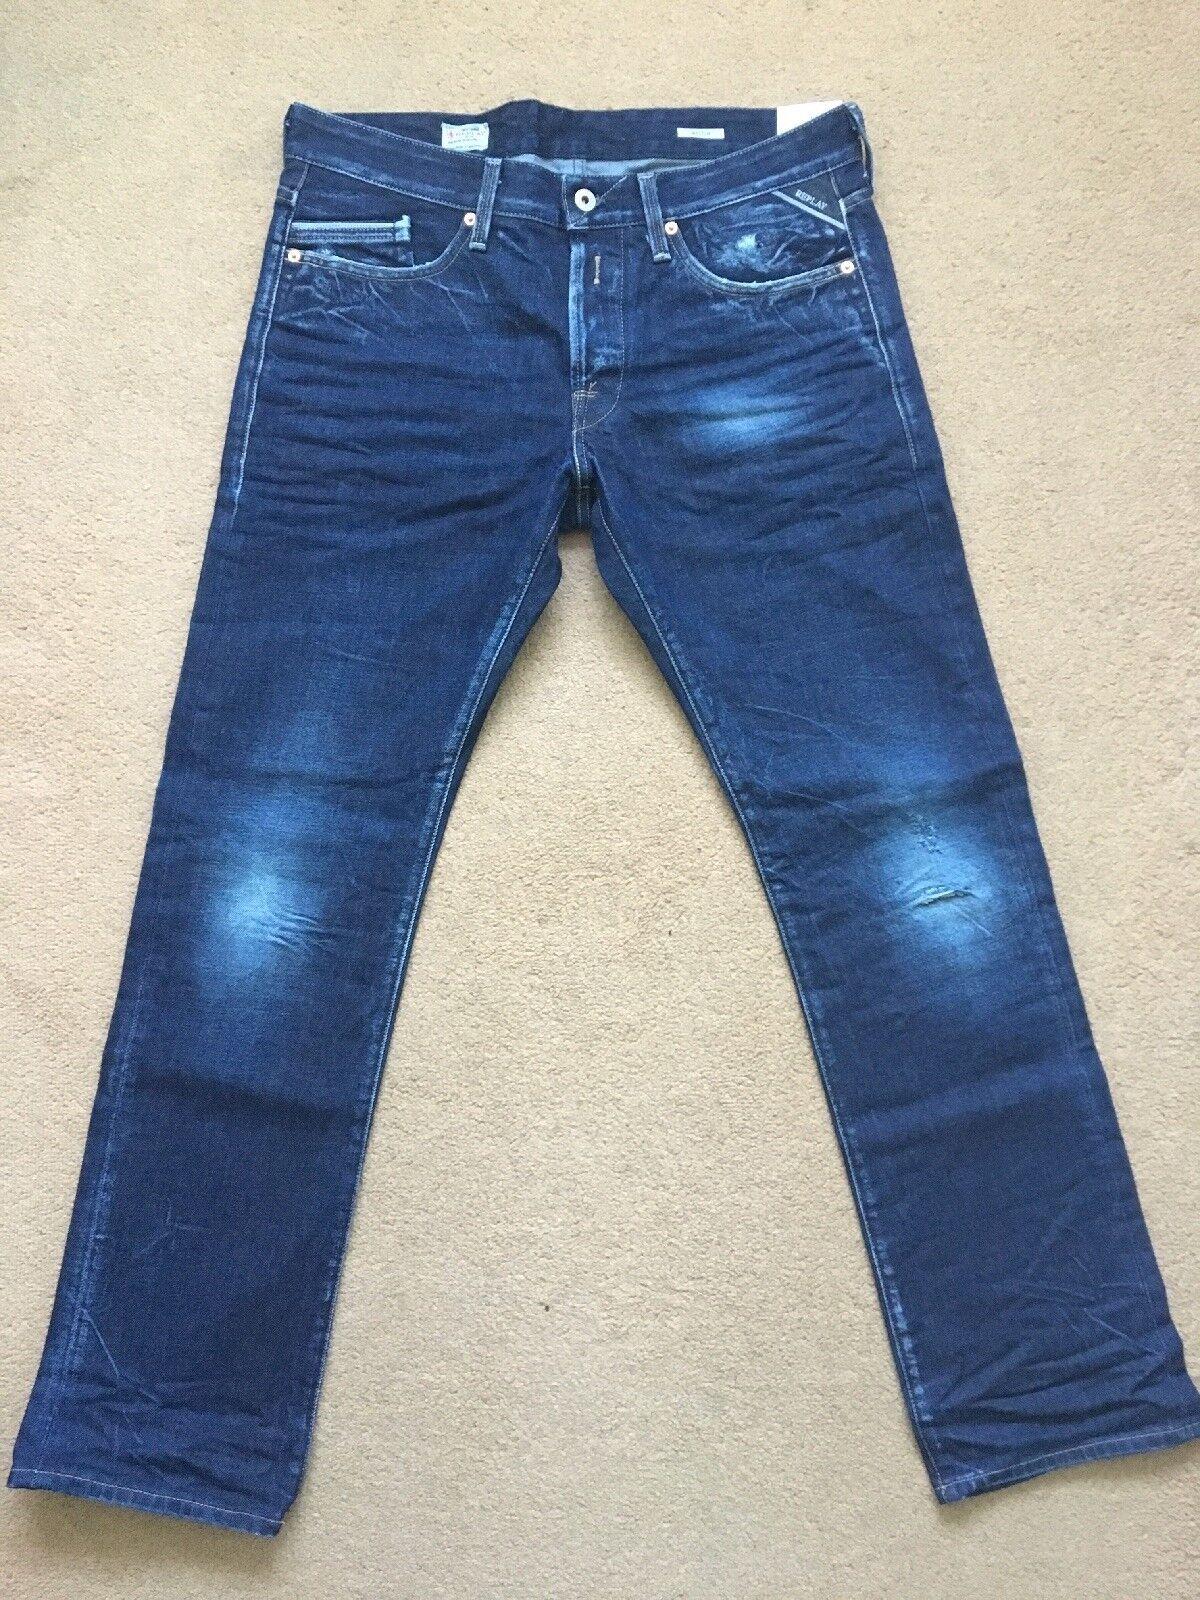 Replay Waitom Original Open-end Regular Slim  's Bleu Bleu Bleu  jeans, W34